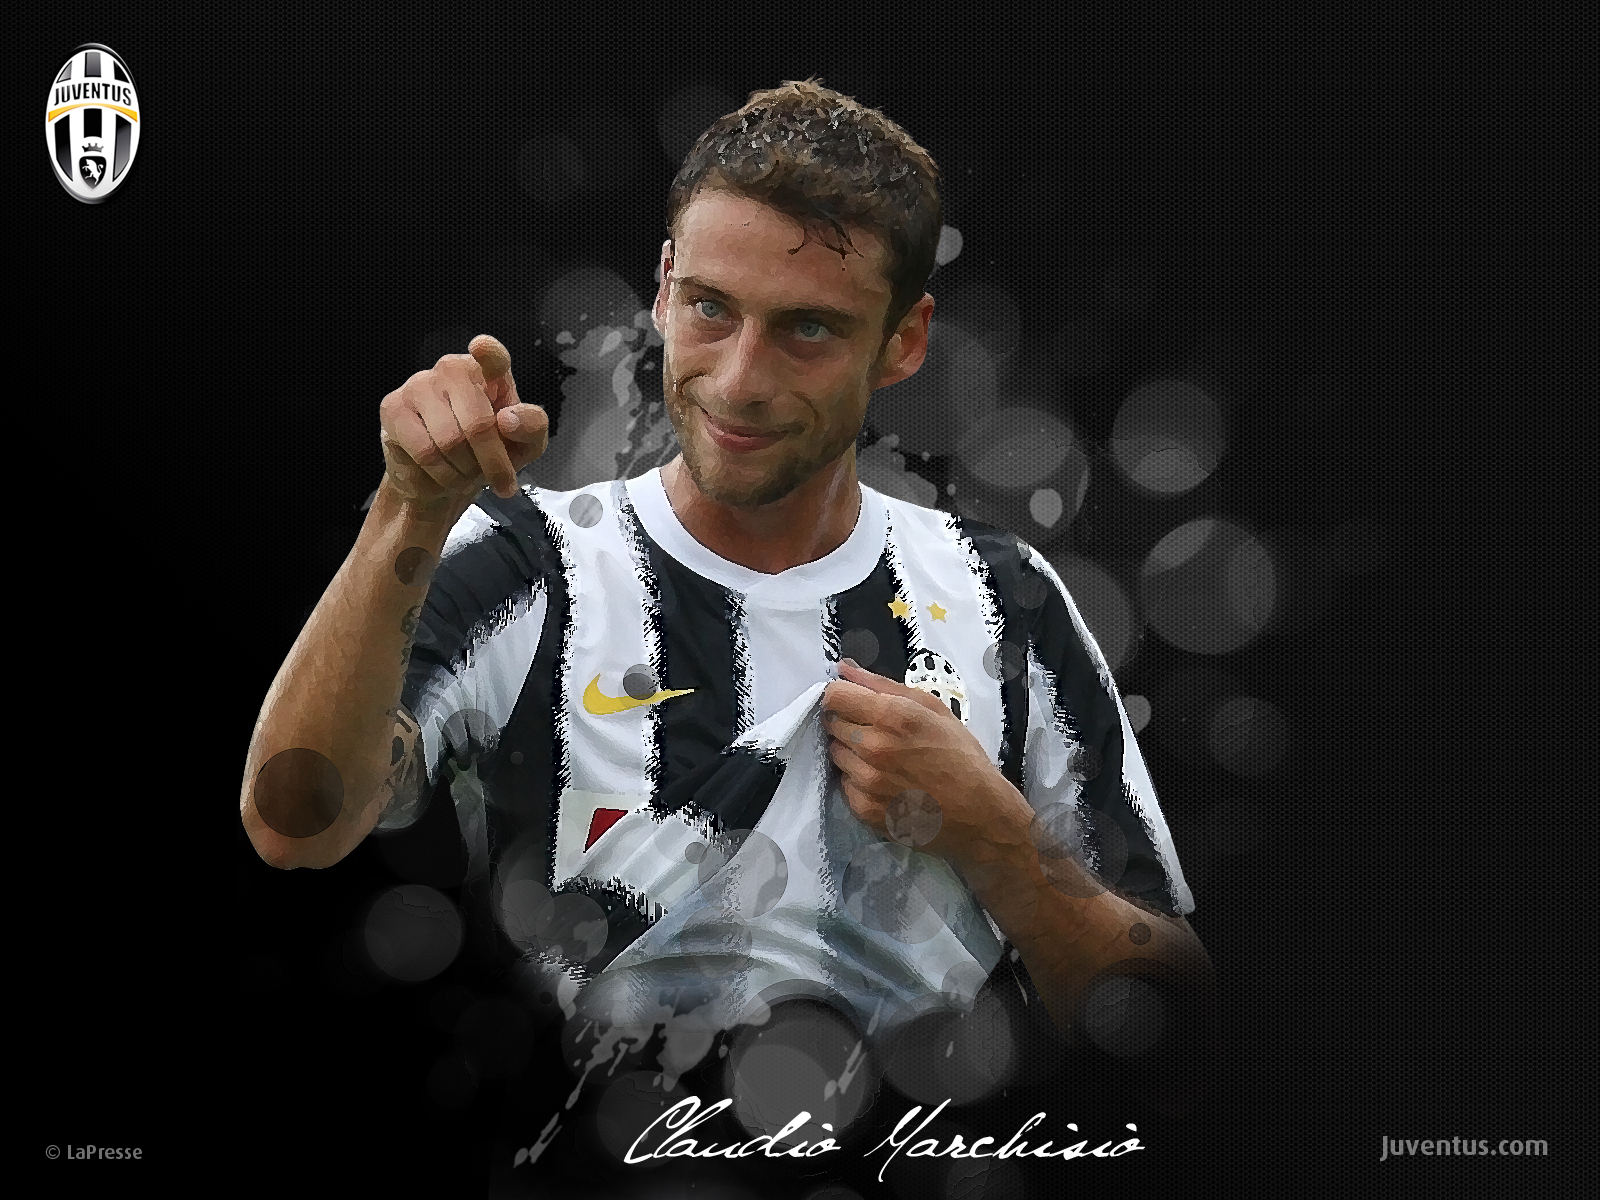 Claudio Marchisio Juventus | Foto Bugil Bokep 2017